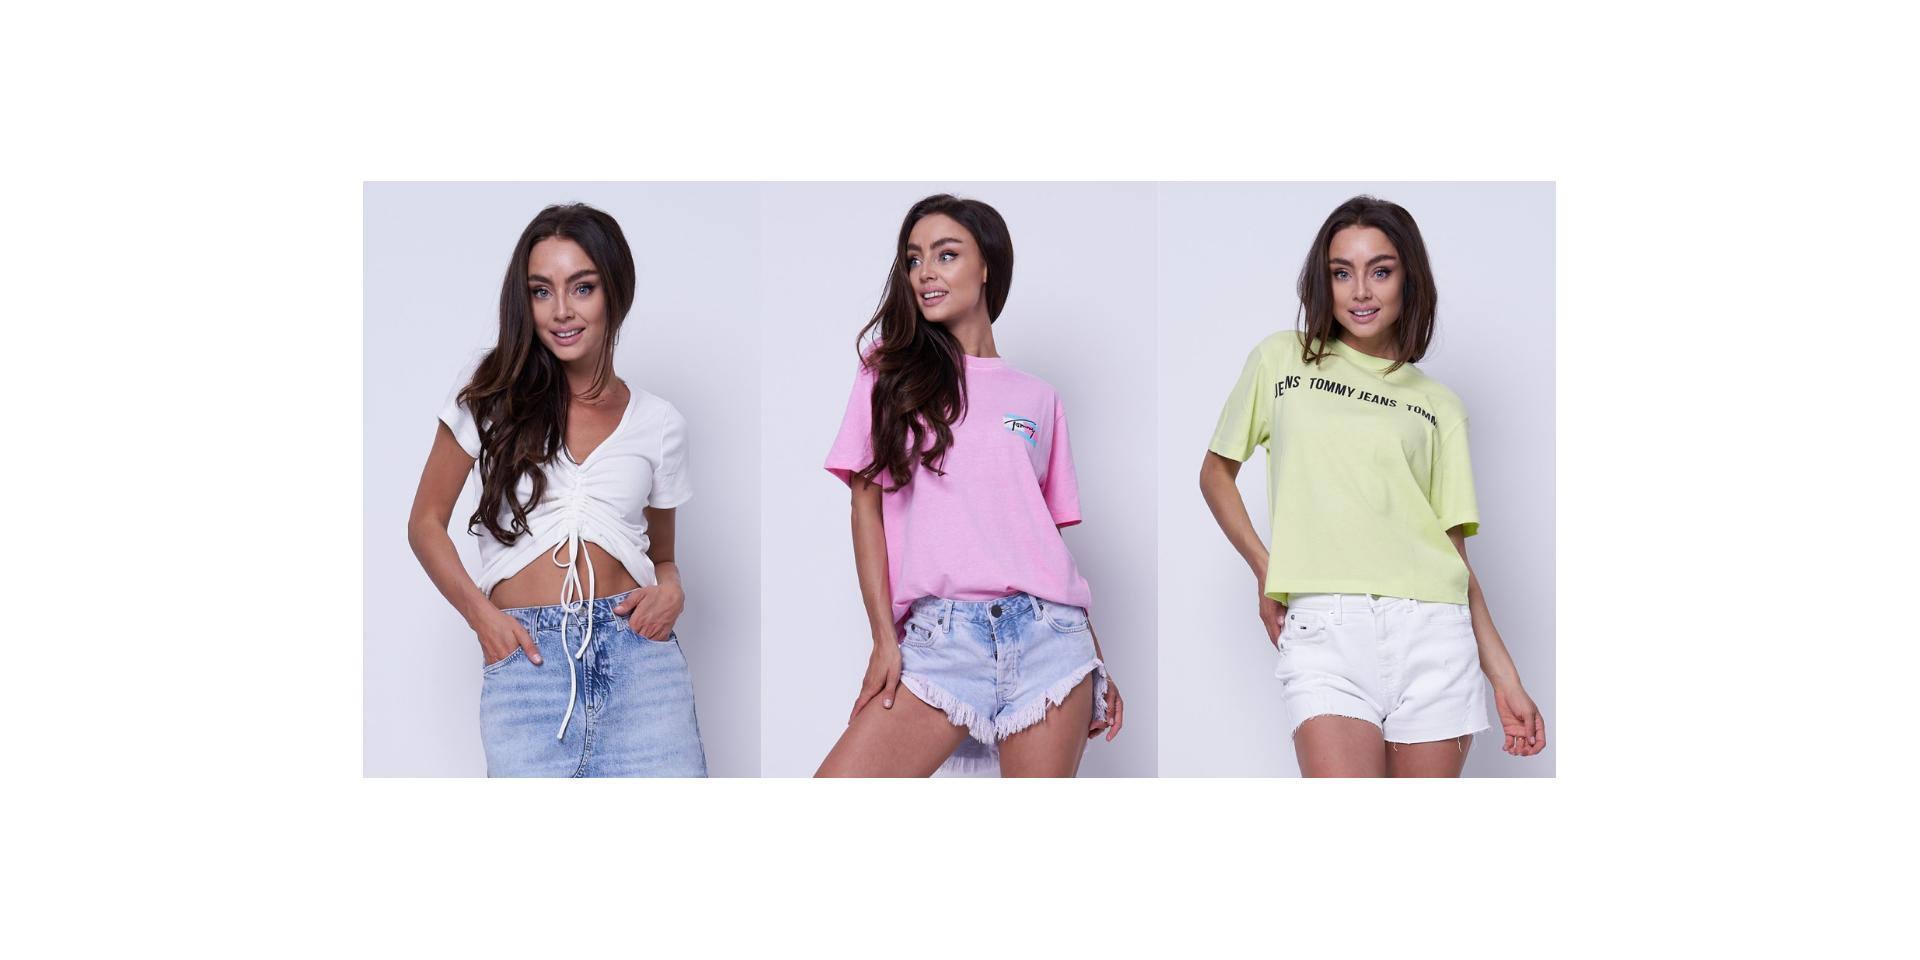 Modne t-shirty damskie na wiosna/lato 2021